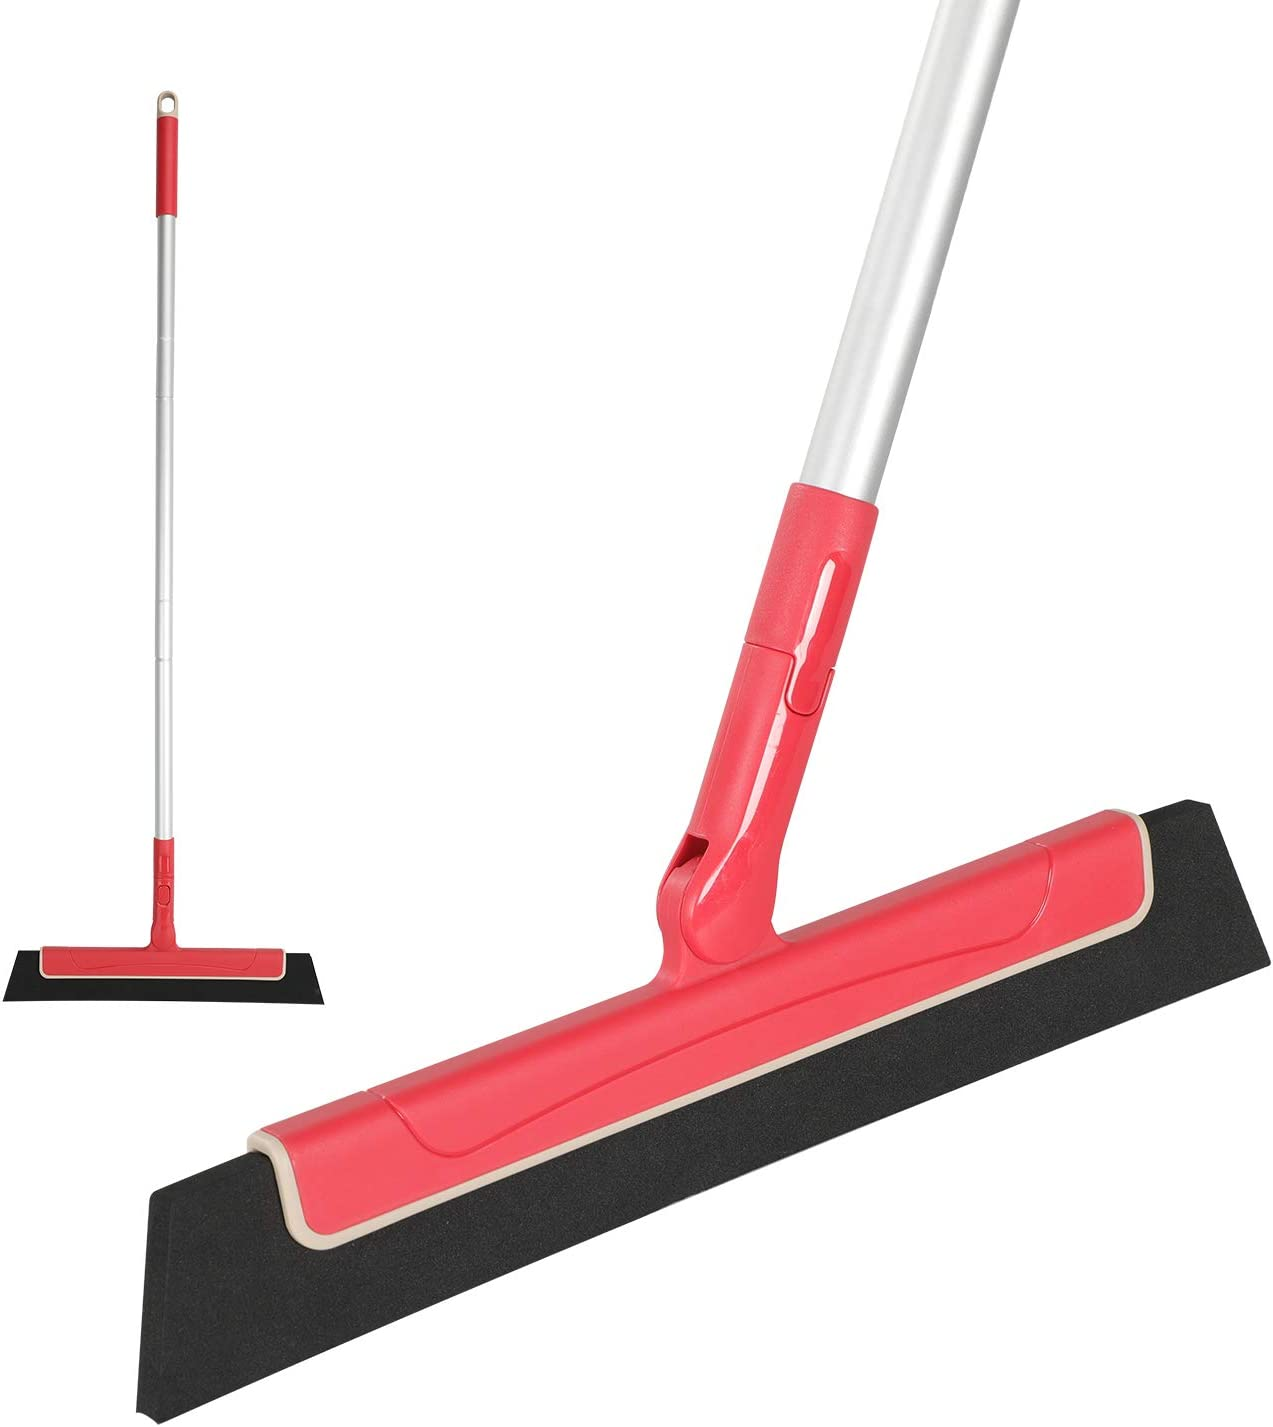 CLEANHOME Floor Squeegee 38in Adjustable Professional Water Sweeper for Bathroom,Perfect forWood Floor,Glass,Window,Tile Shower Pool Deck Pet Hair Floor Wiper Squeegee Broom